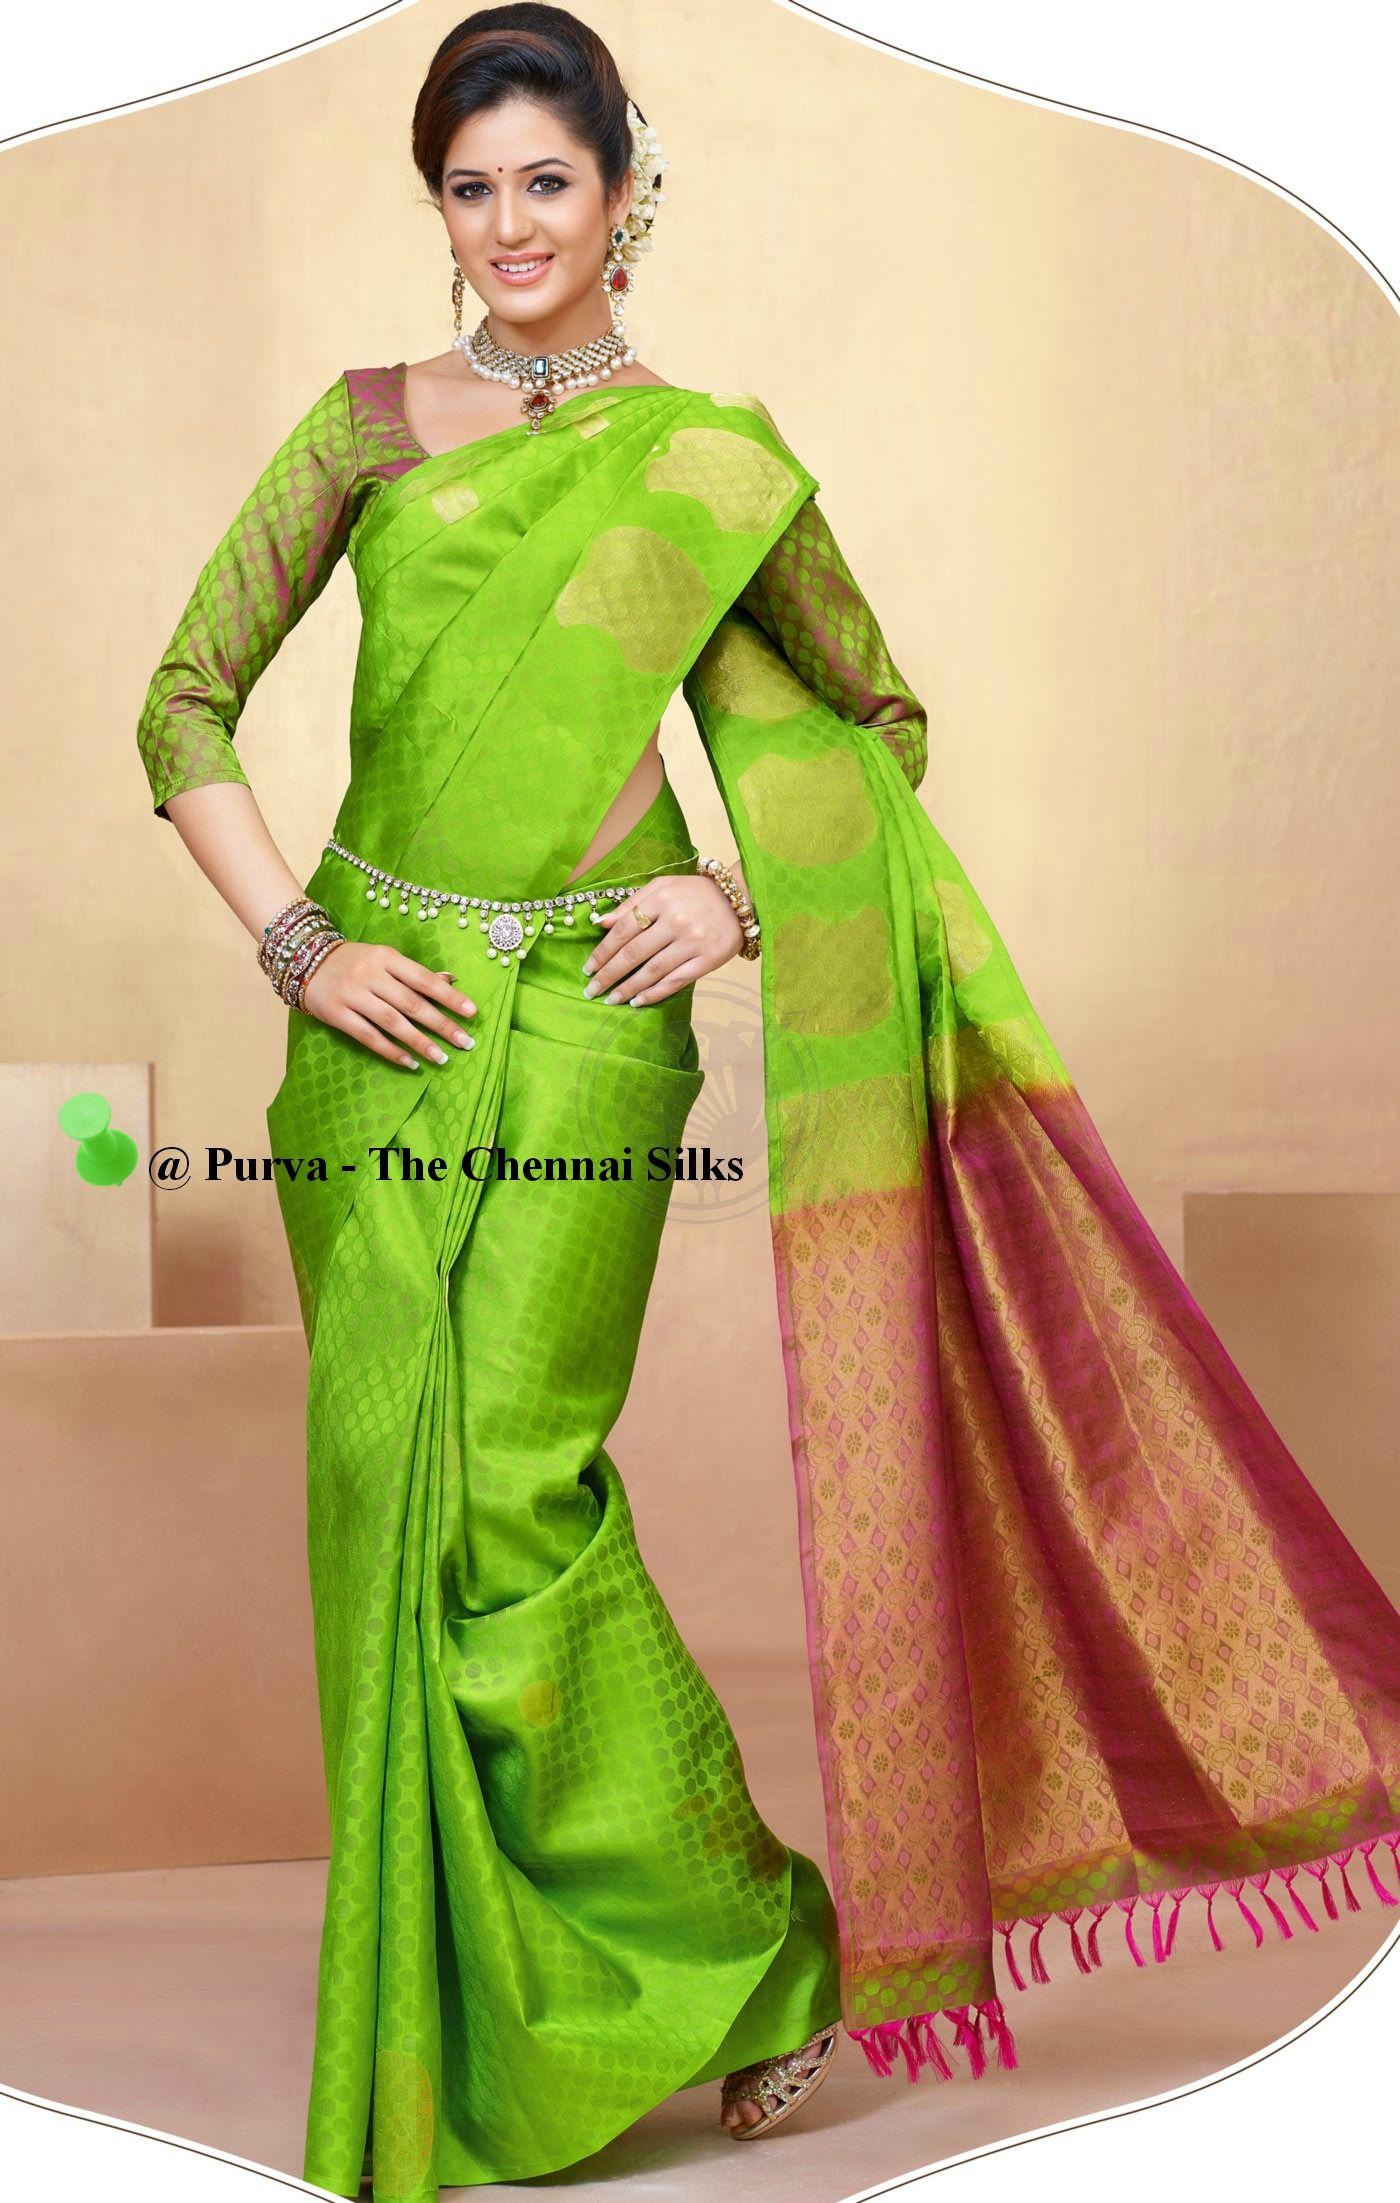 Purva Green Red Silk Saree Source The Chennai Silks Soft Silk Sarees Silk Sarees Fashion